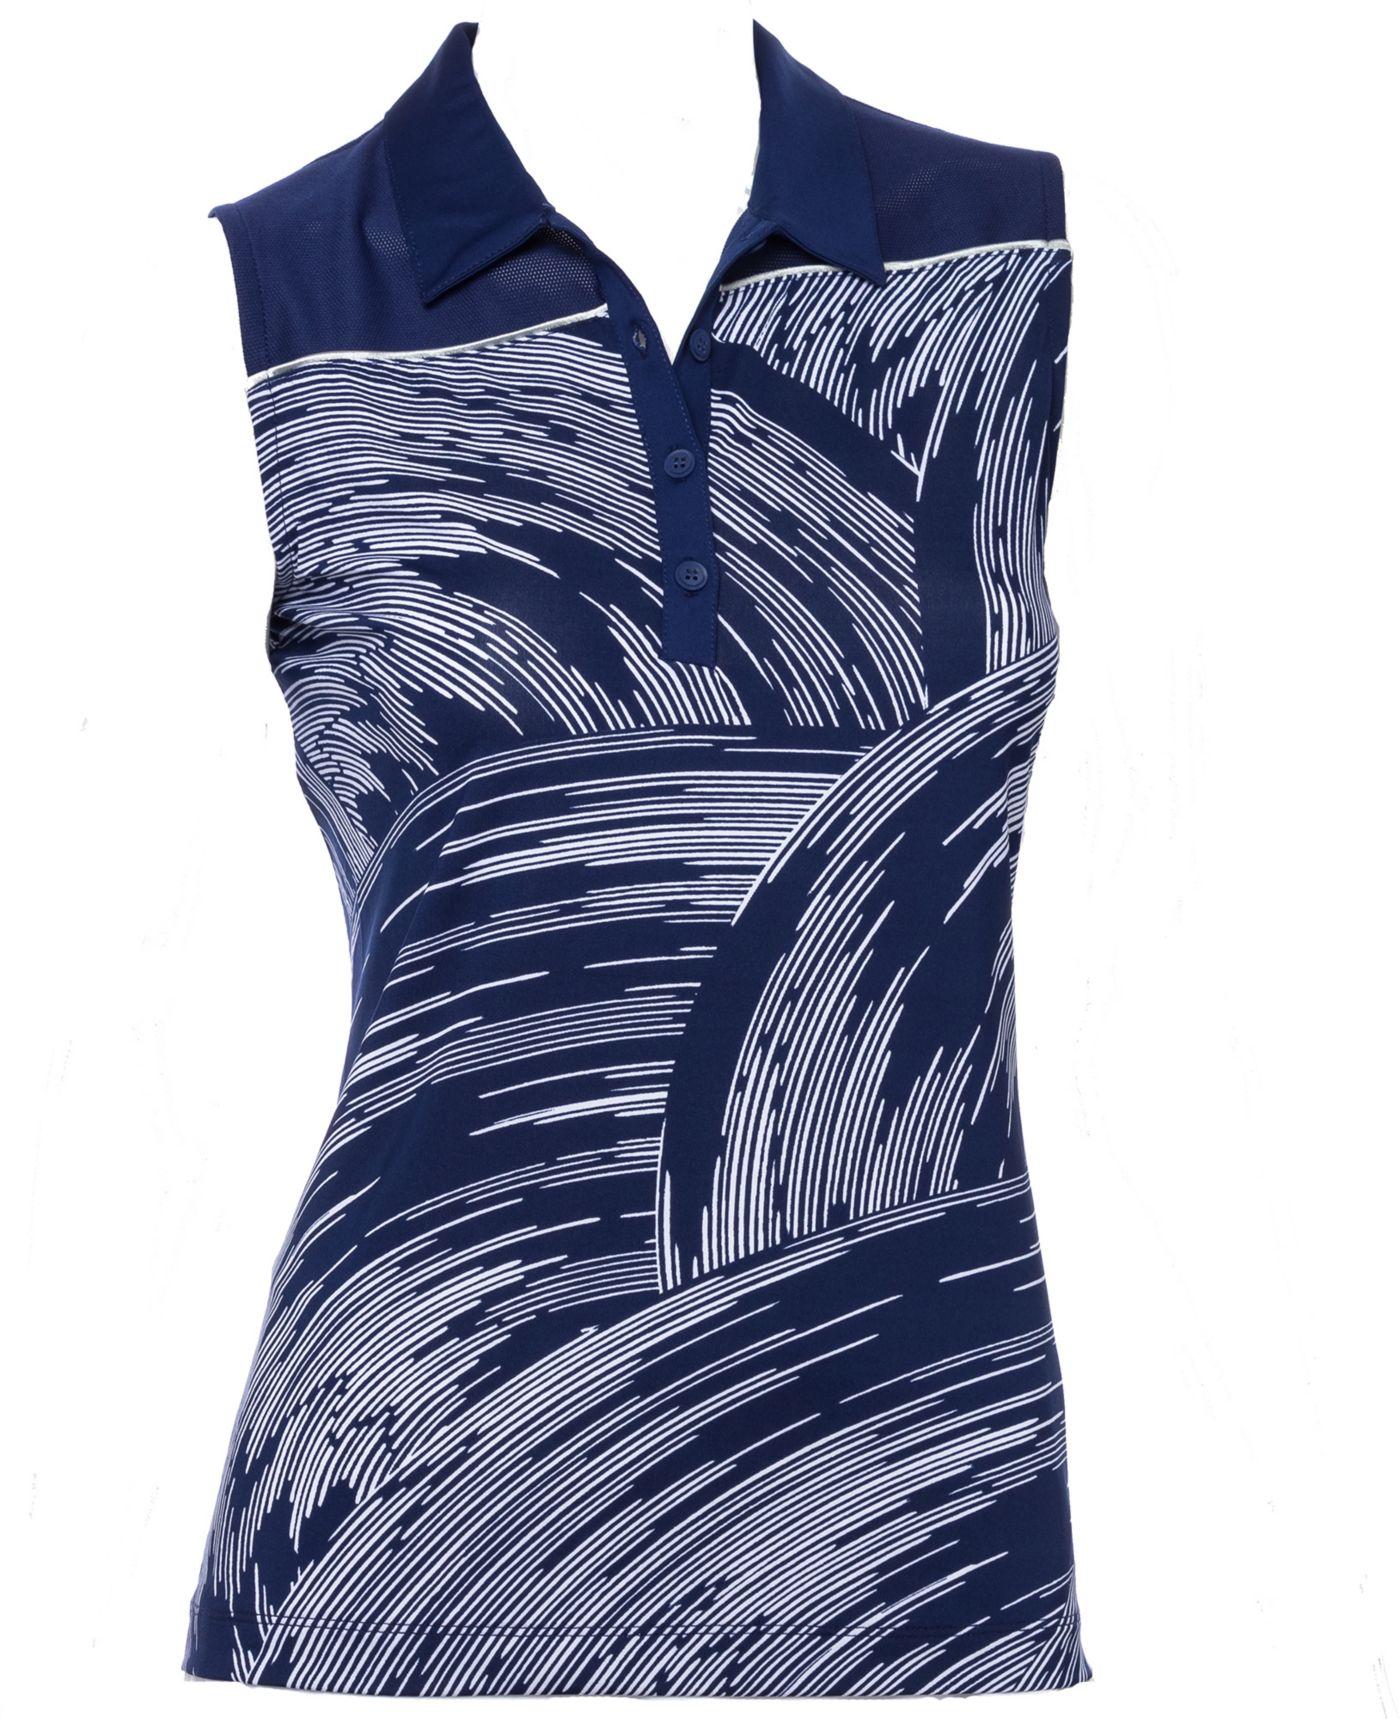 EP Pro Women's Sleeveless Swirl Print Golf Polo